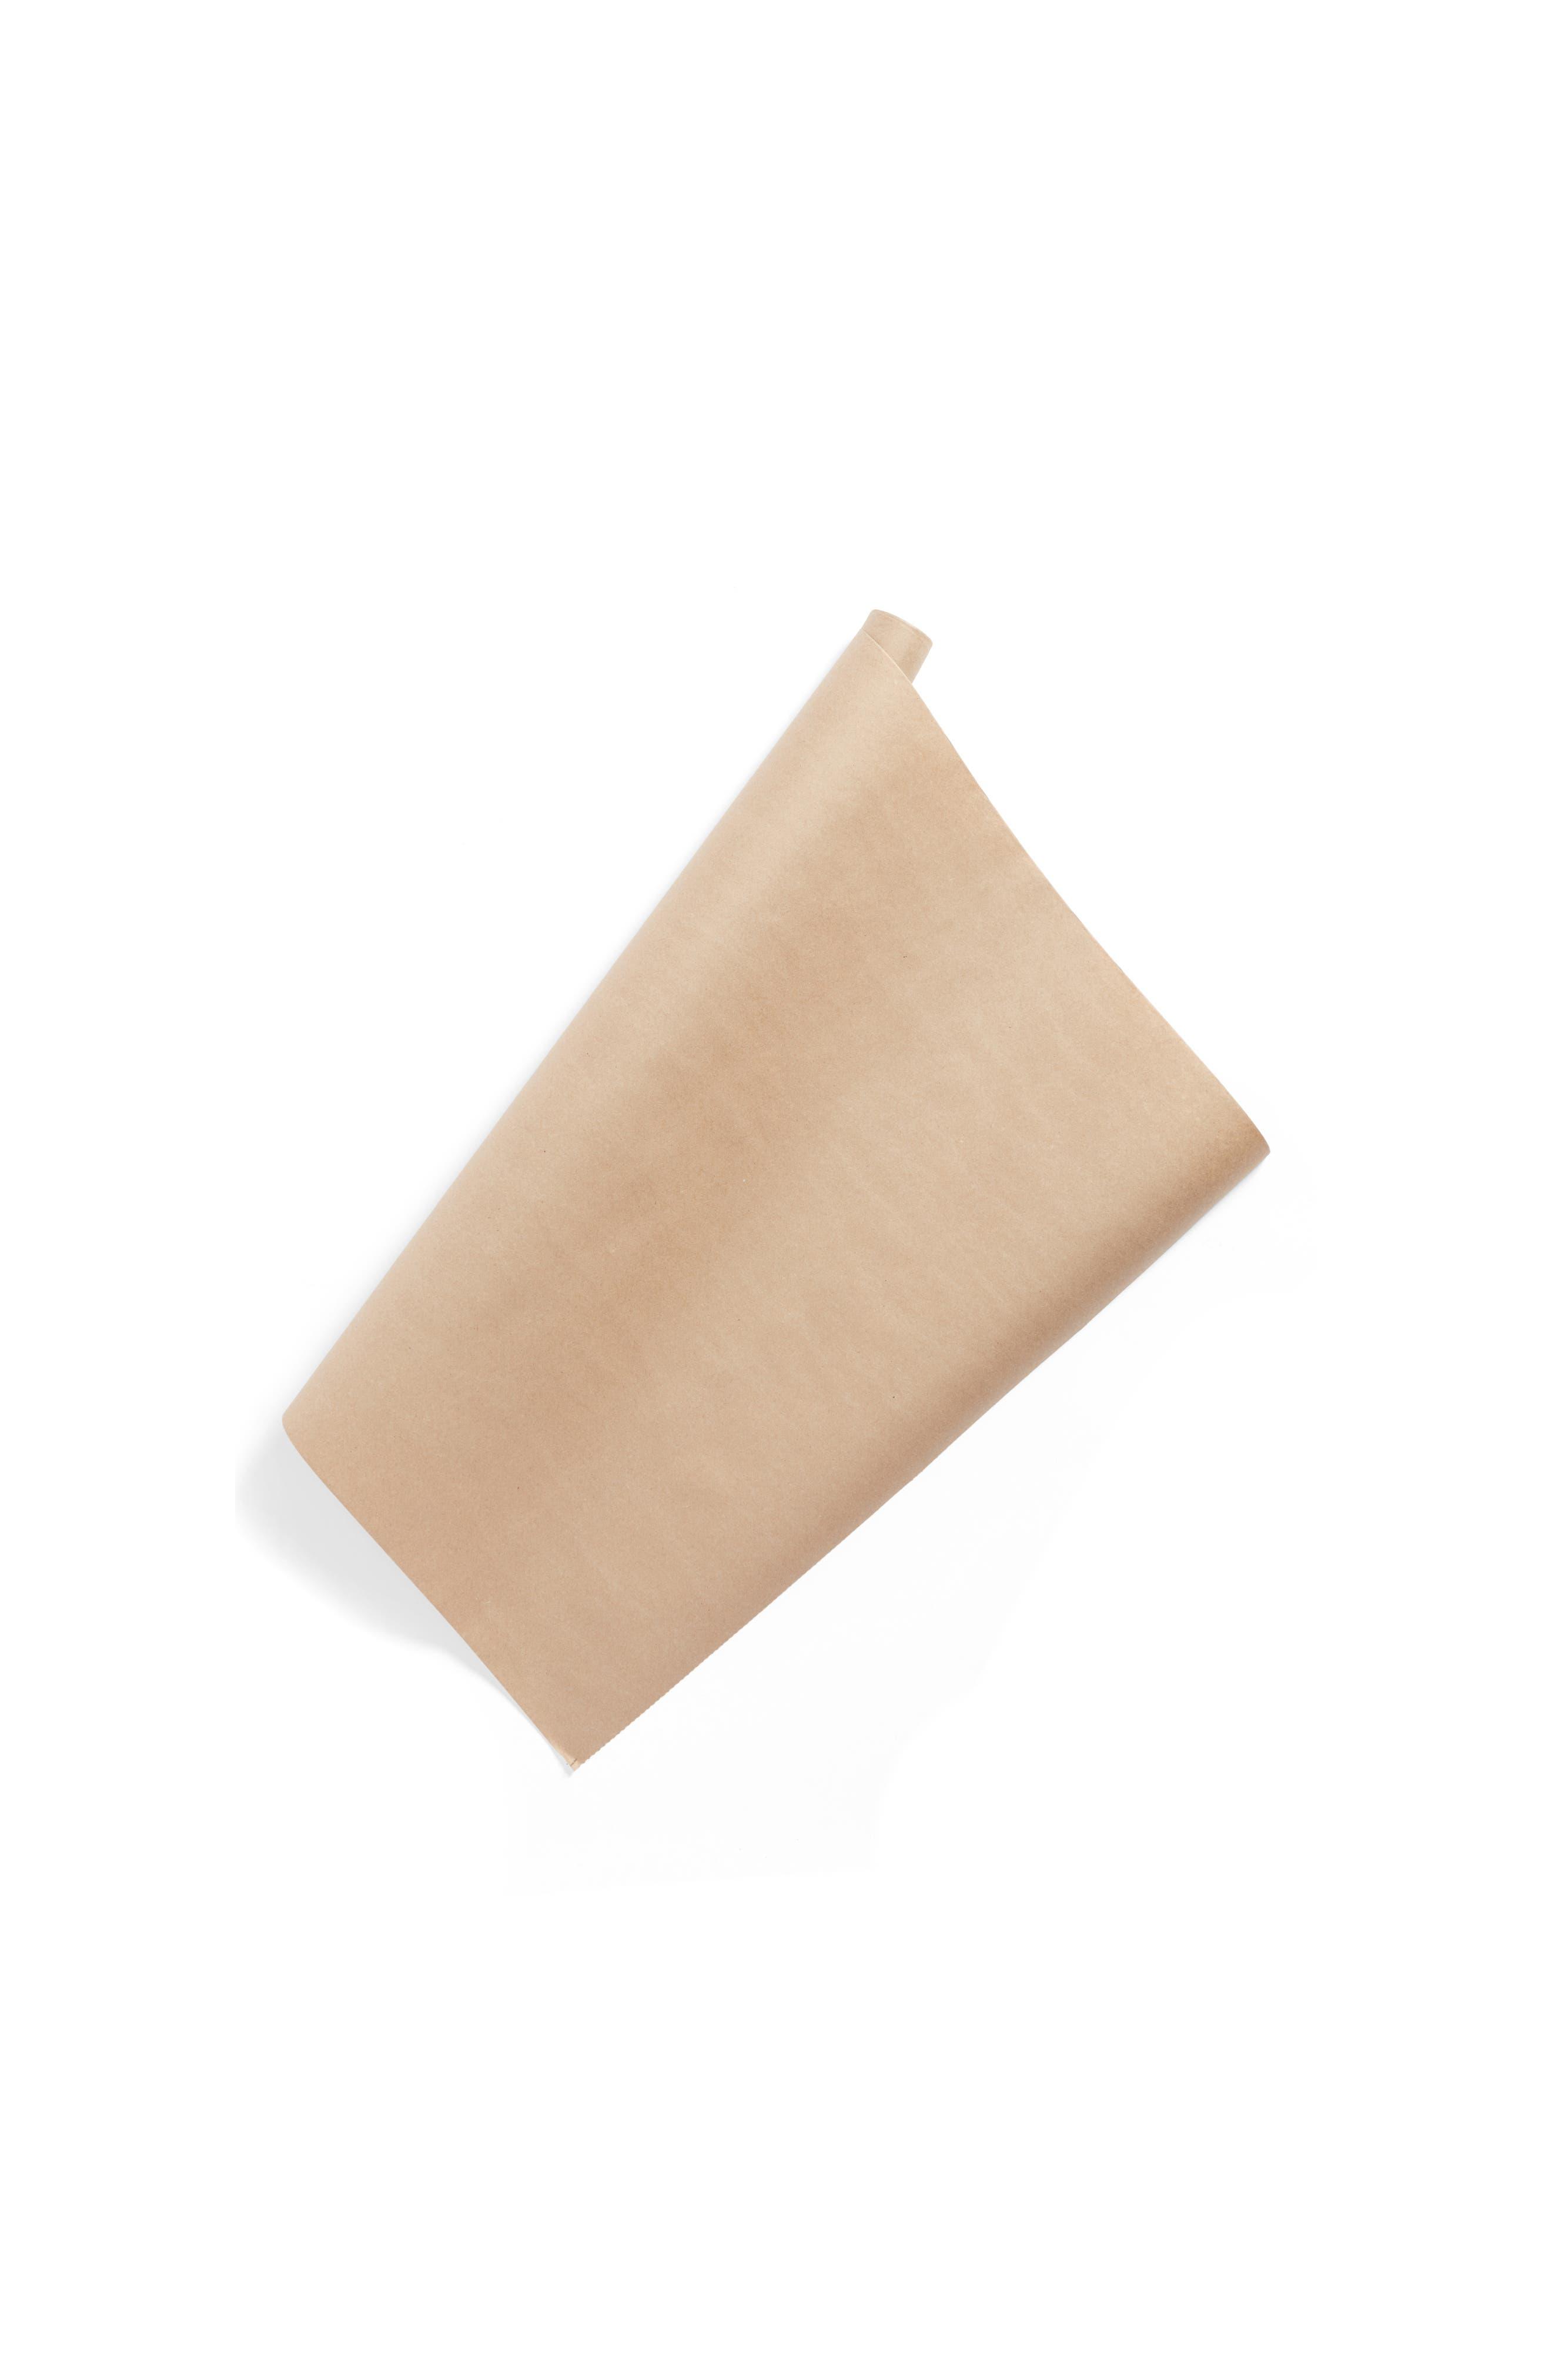 Knot & Bow Kraft Gift Wrap